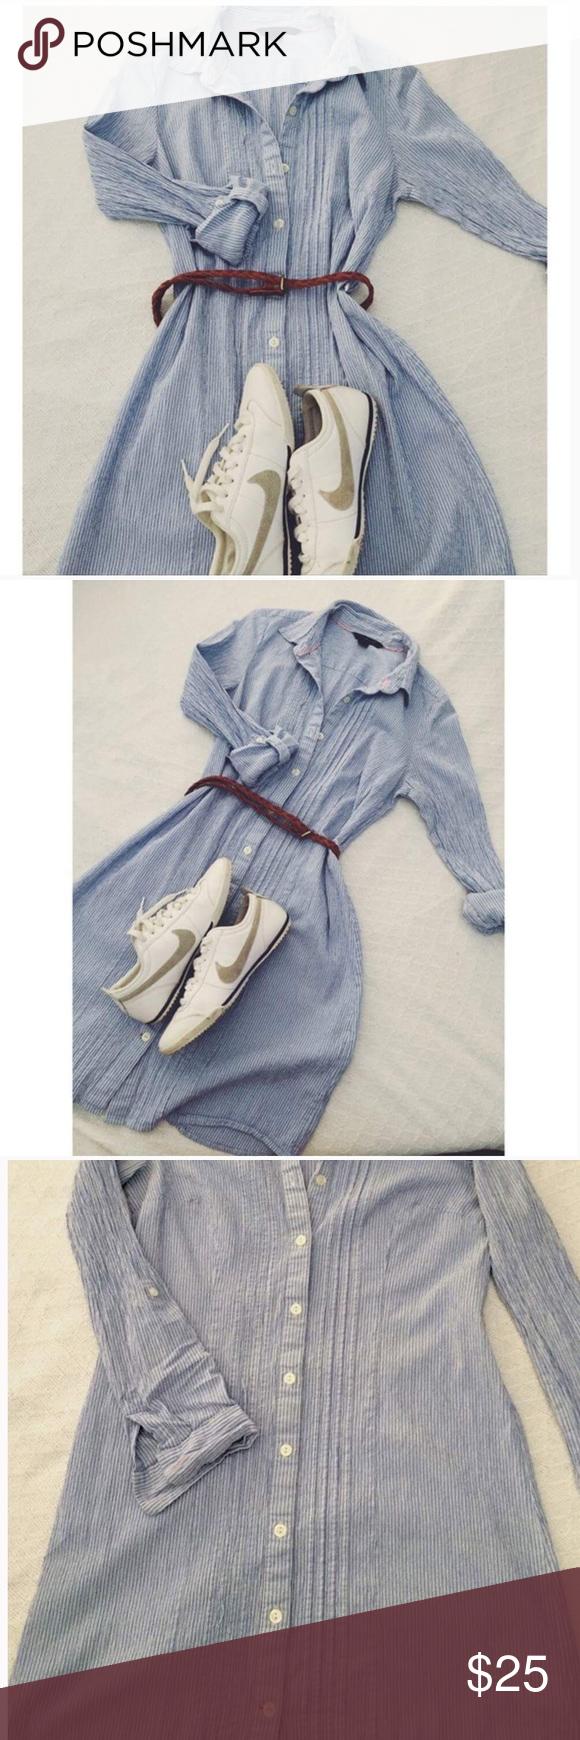 ✨Black Friday Sale✨ Tommy Hilfiger Dress Tommy Hilfiger Dress 💛 Size M 💛 Belt not included Tommy Hilfiger Dresses Midi